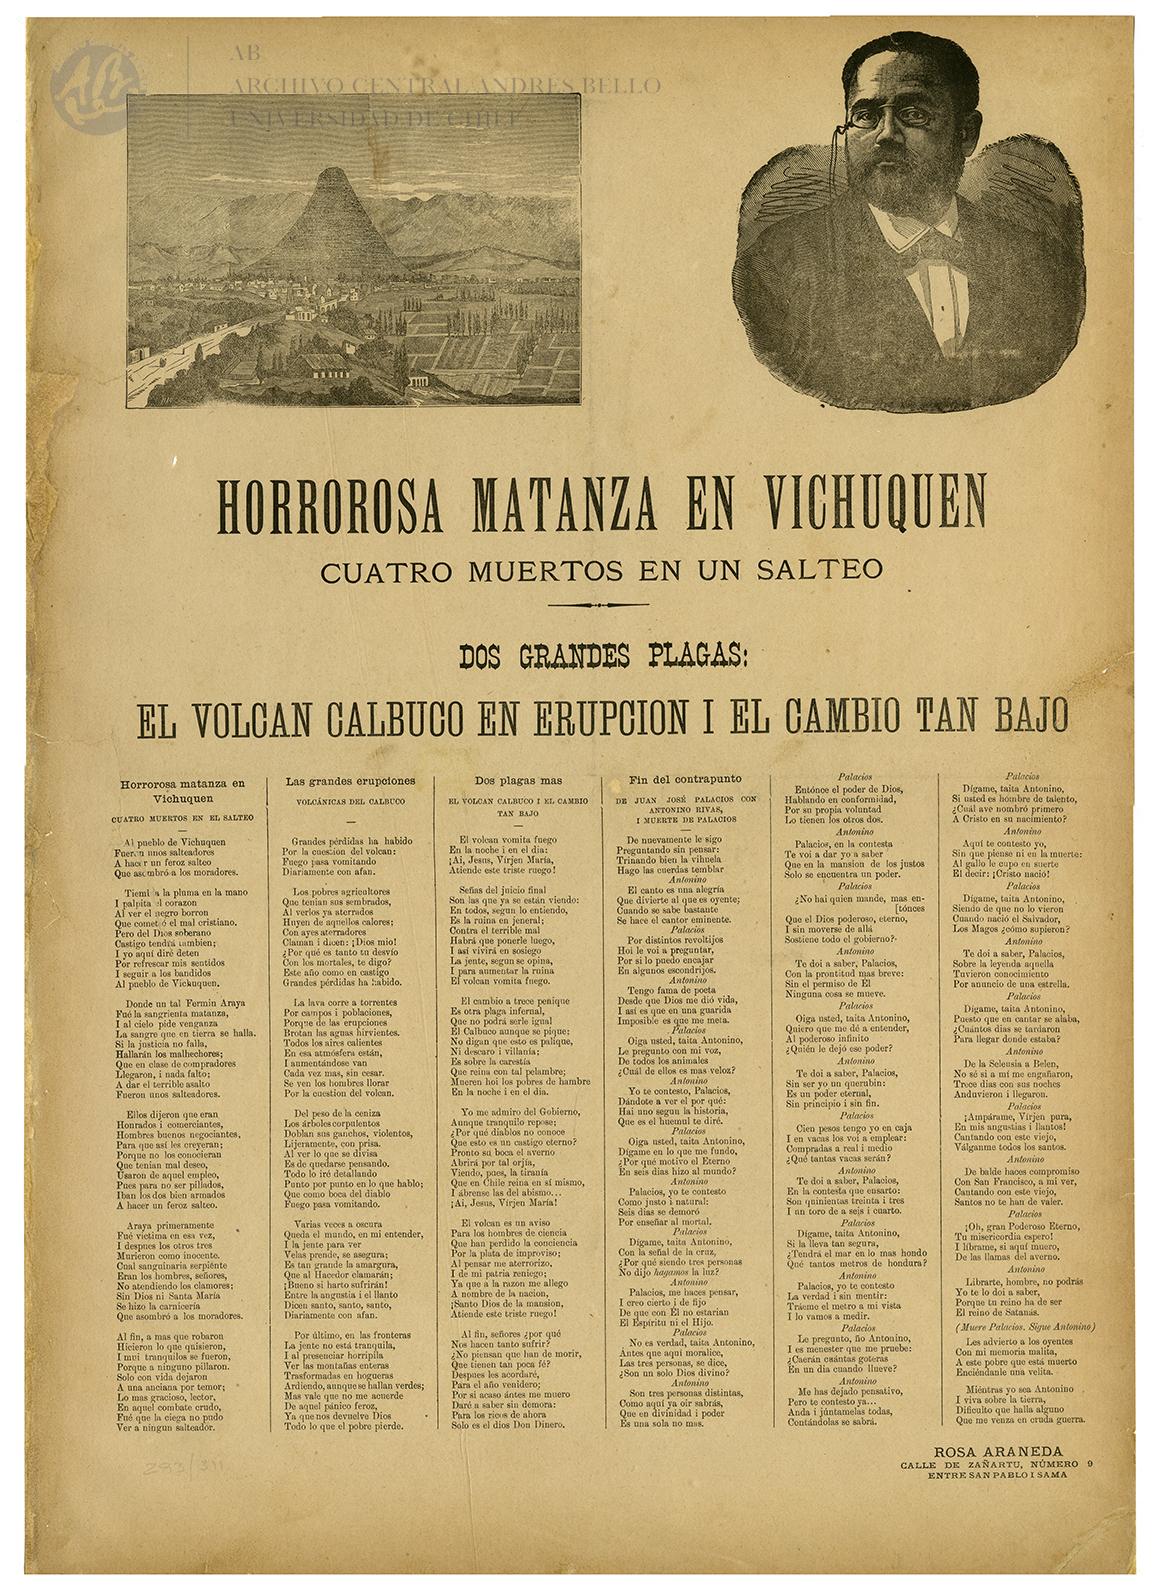 Lira Popular: Rosa Araneda